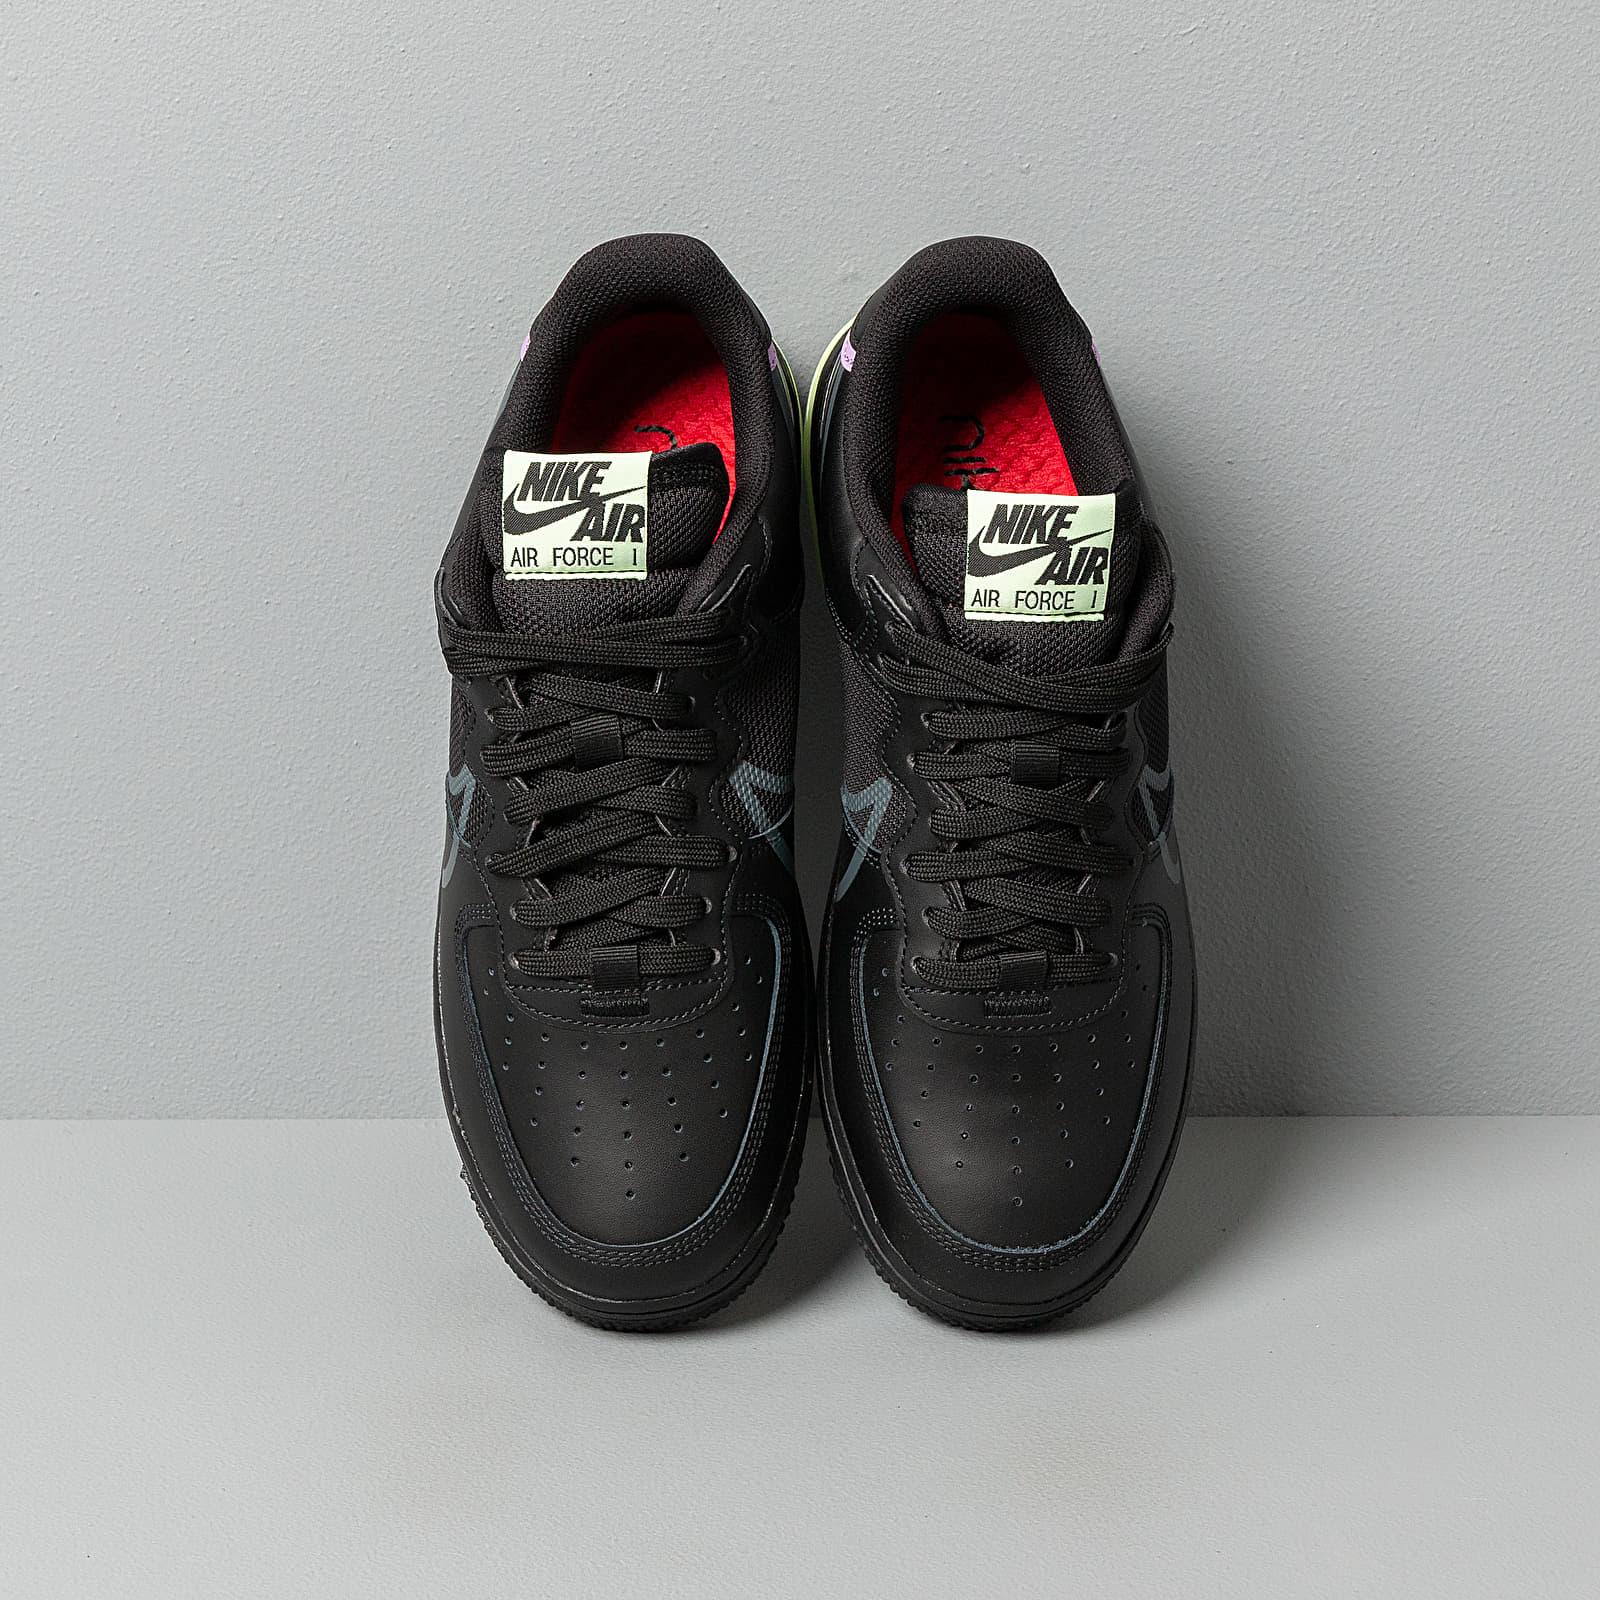 Nike Air Force 1 React Black Anthracite Violet Star Barely Volt | Footshop